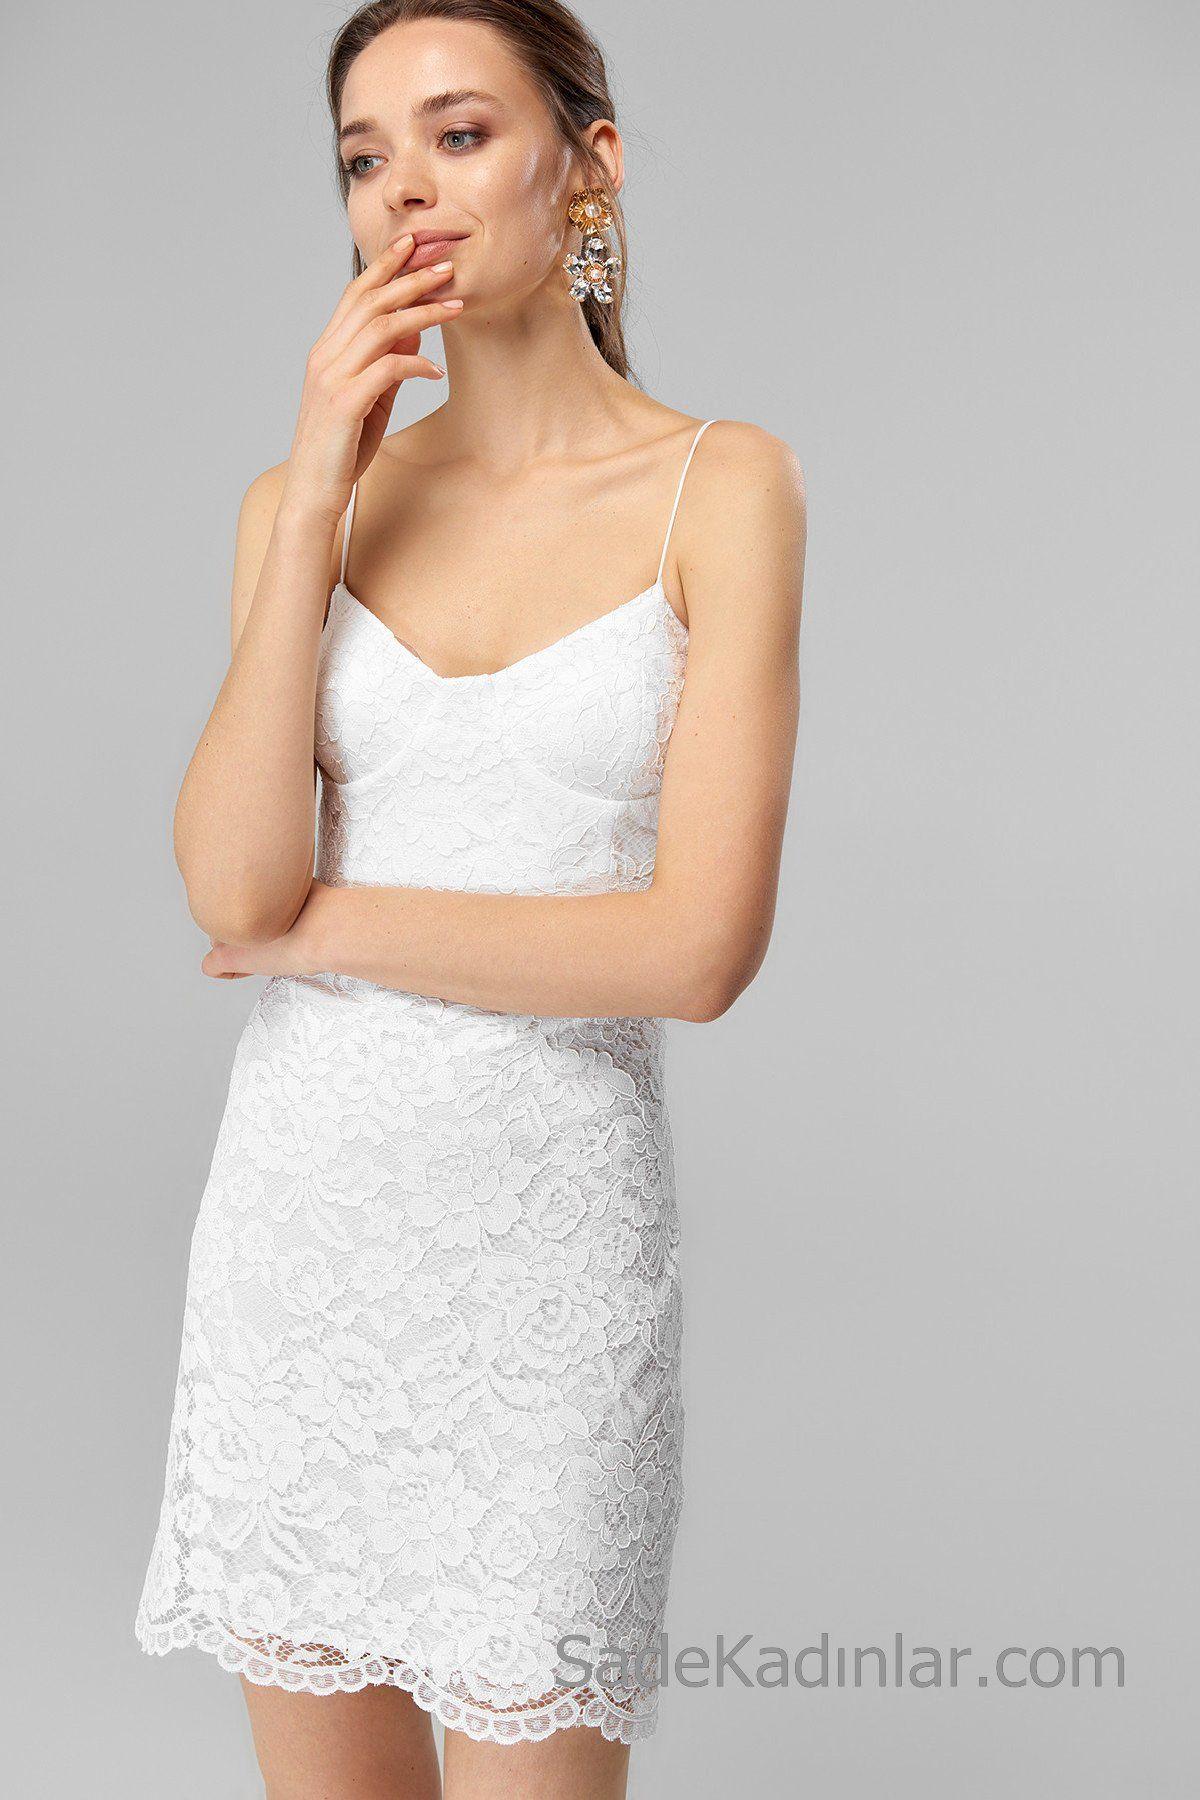 2020 Dantel Elbise Modelleri Beyaz Kisa Ip Askili Dantel Elbise Elbise Modelleri Elbise